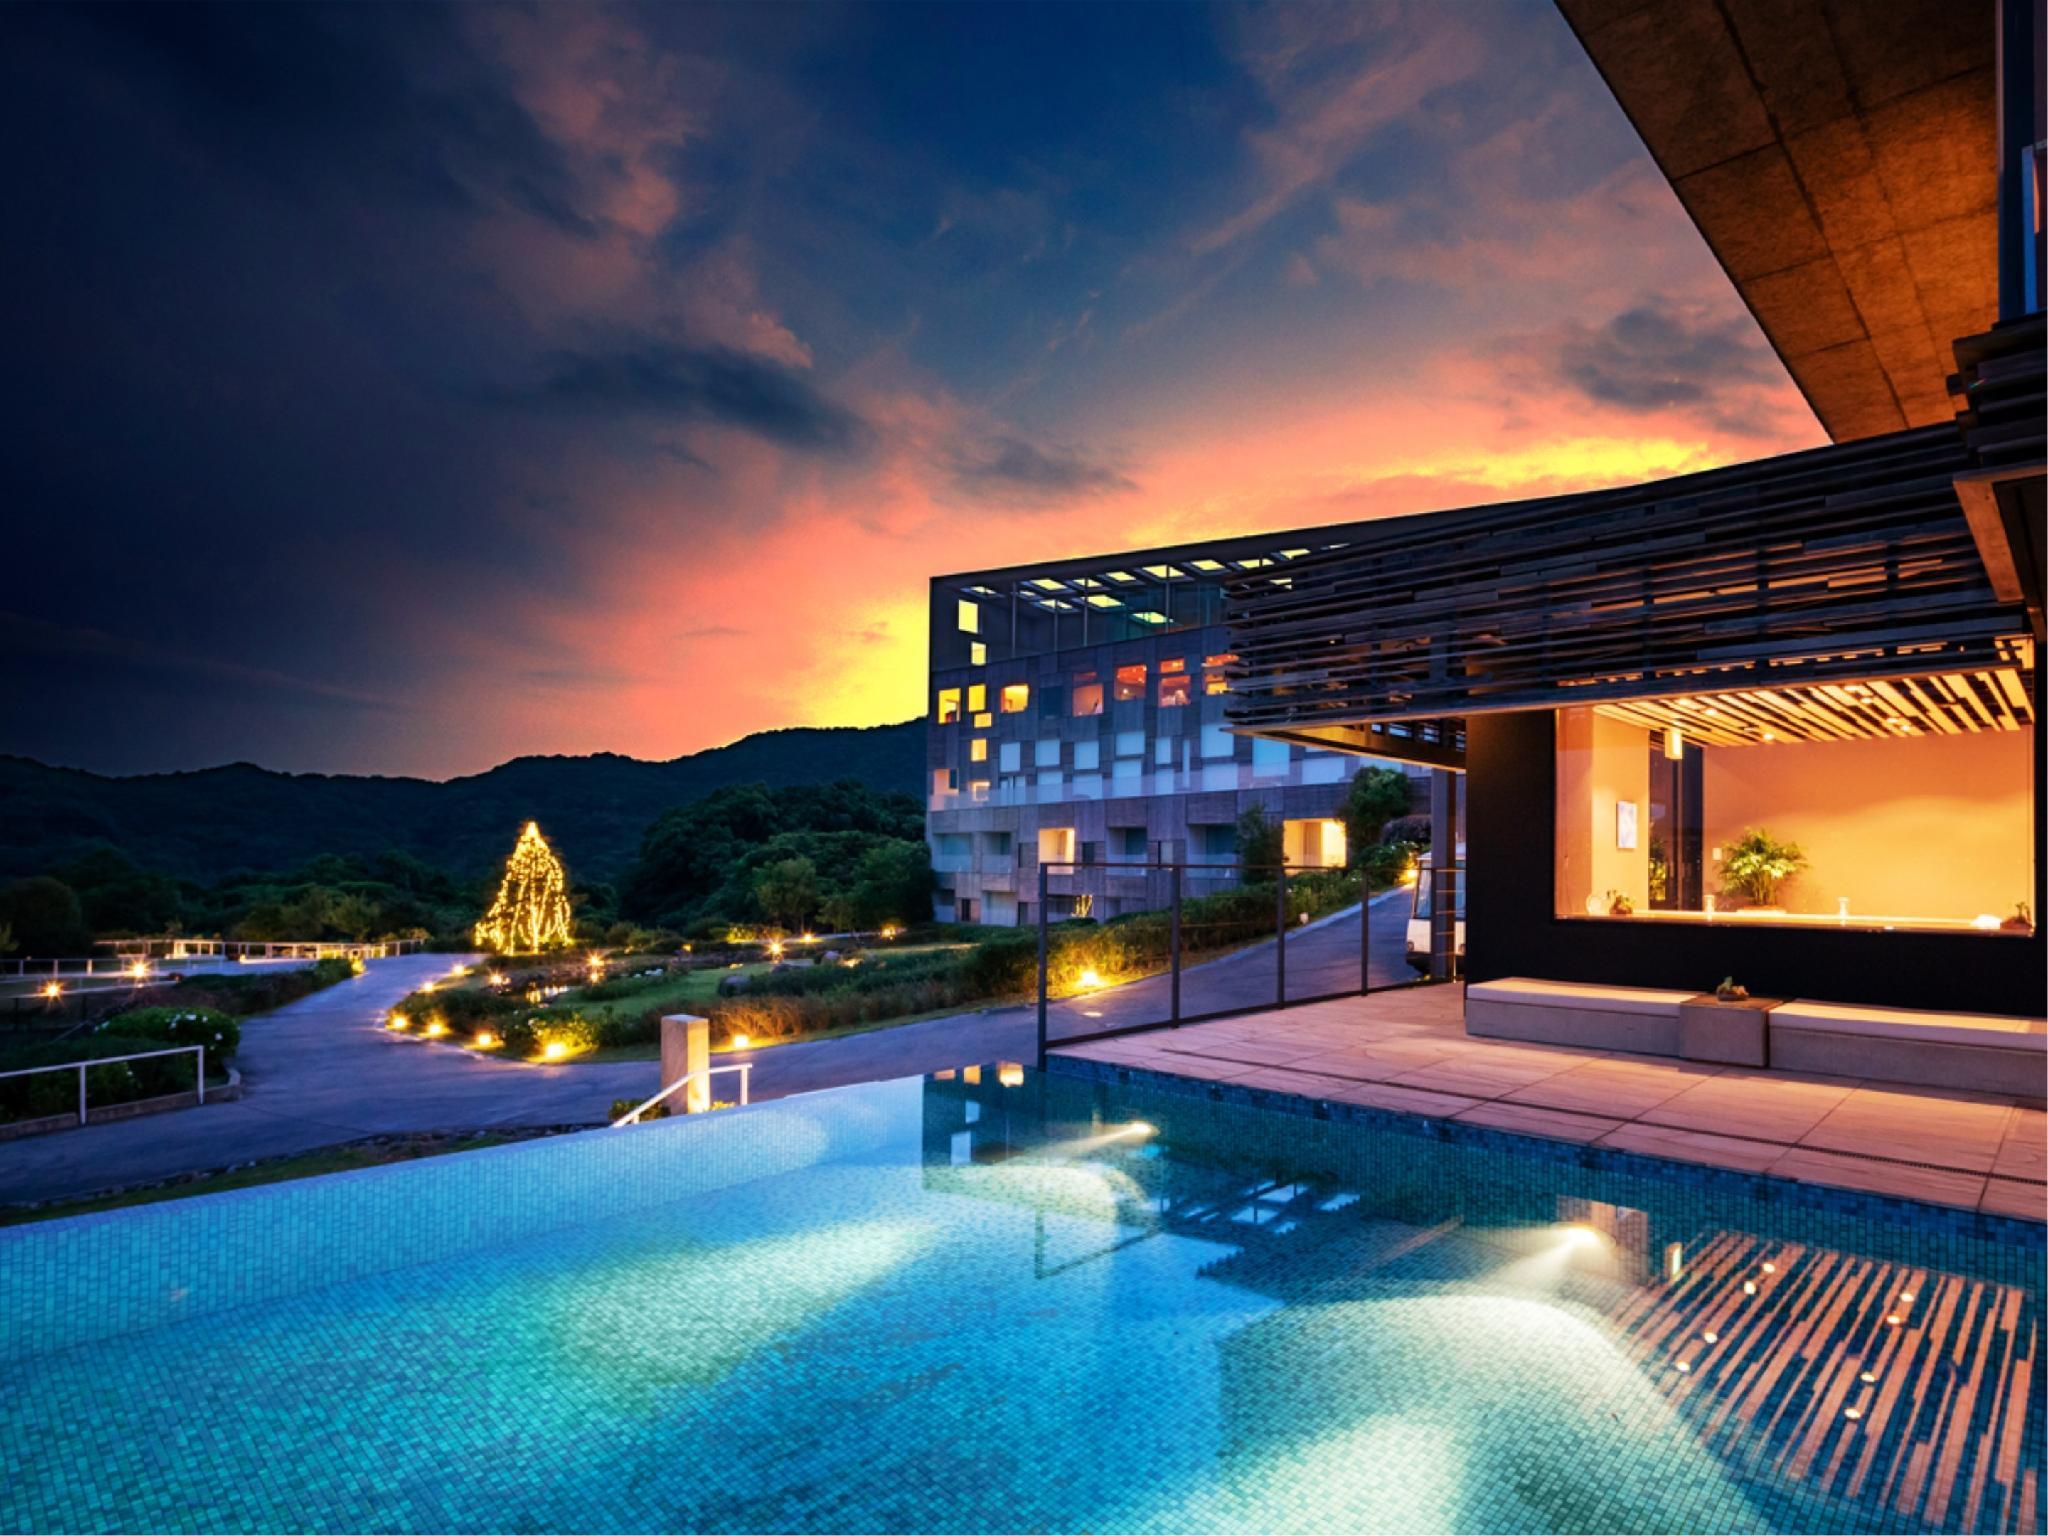 Garden Terrace Nagasaki Hotels Resorts